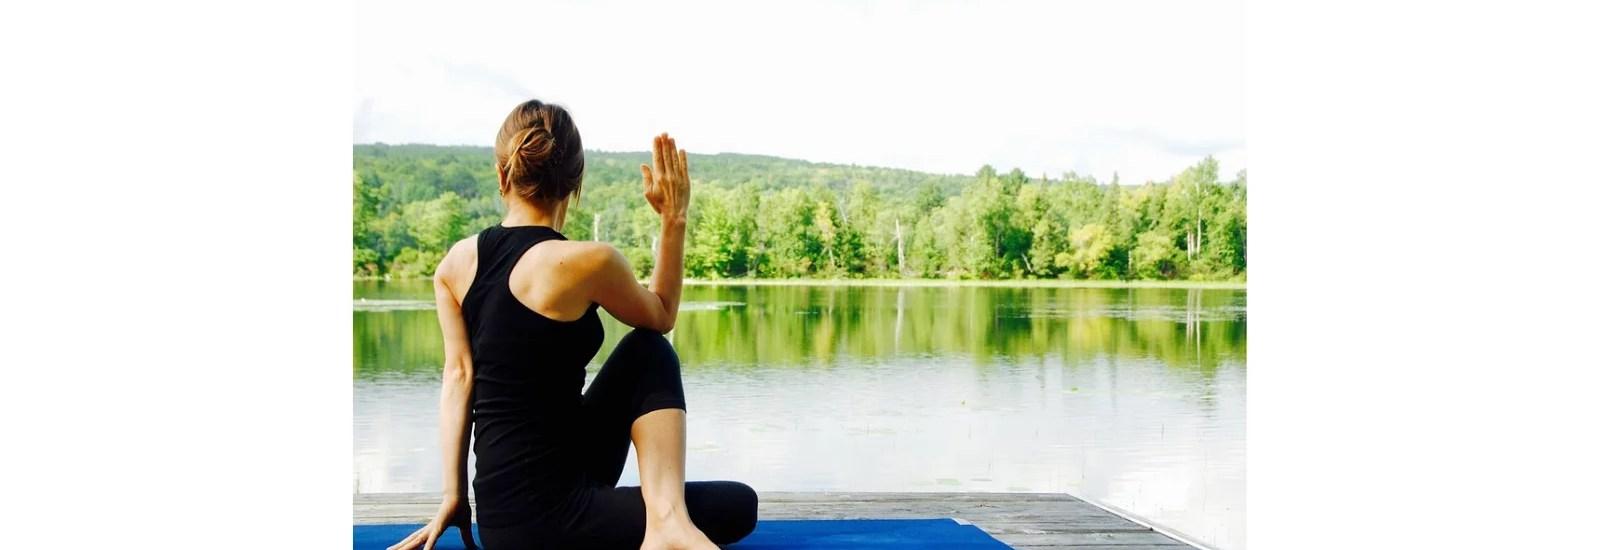 Yoga and Pranayama to Keep You Cool Through Summer